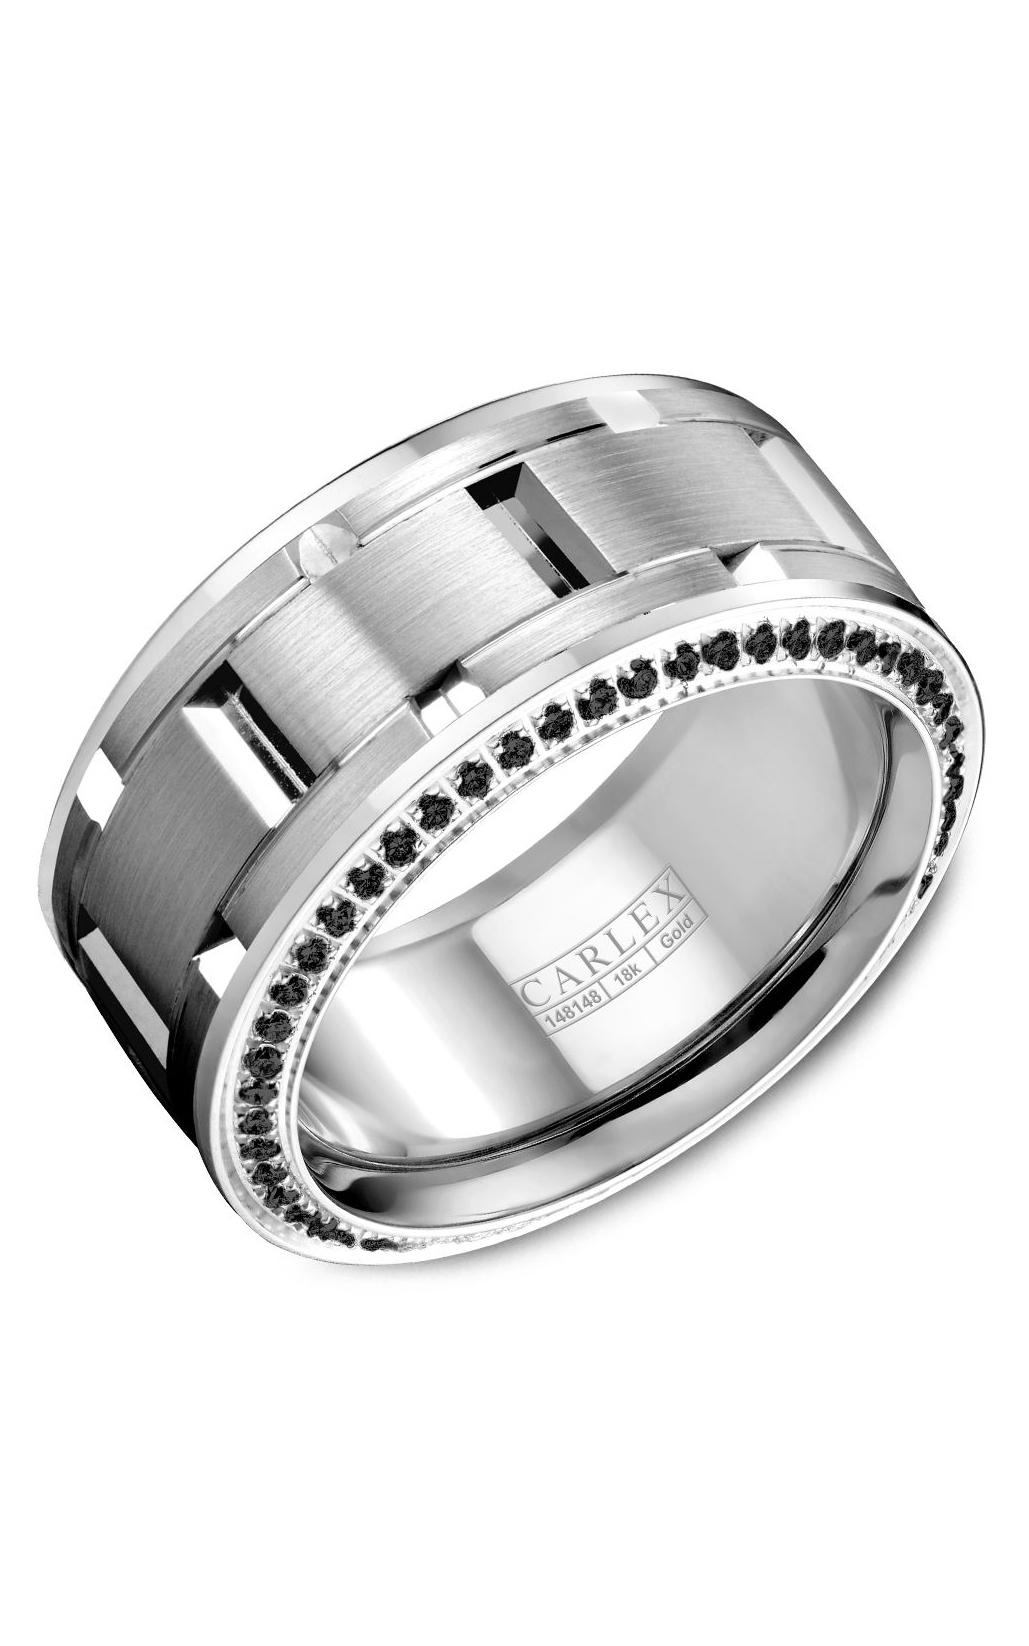 Carlex G1 CX1-0005WWBD product image